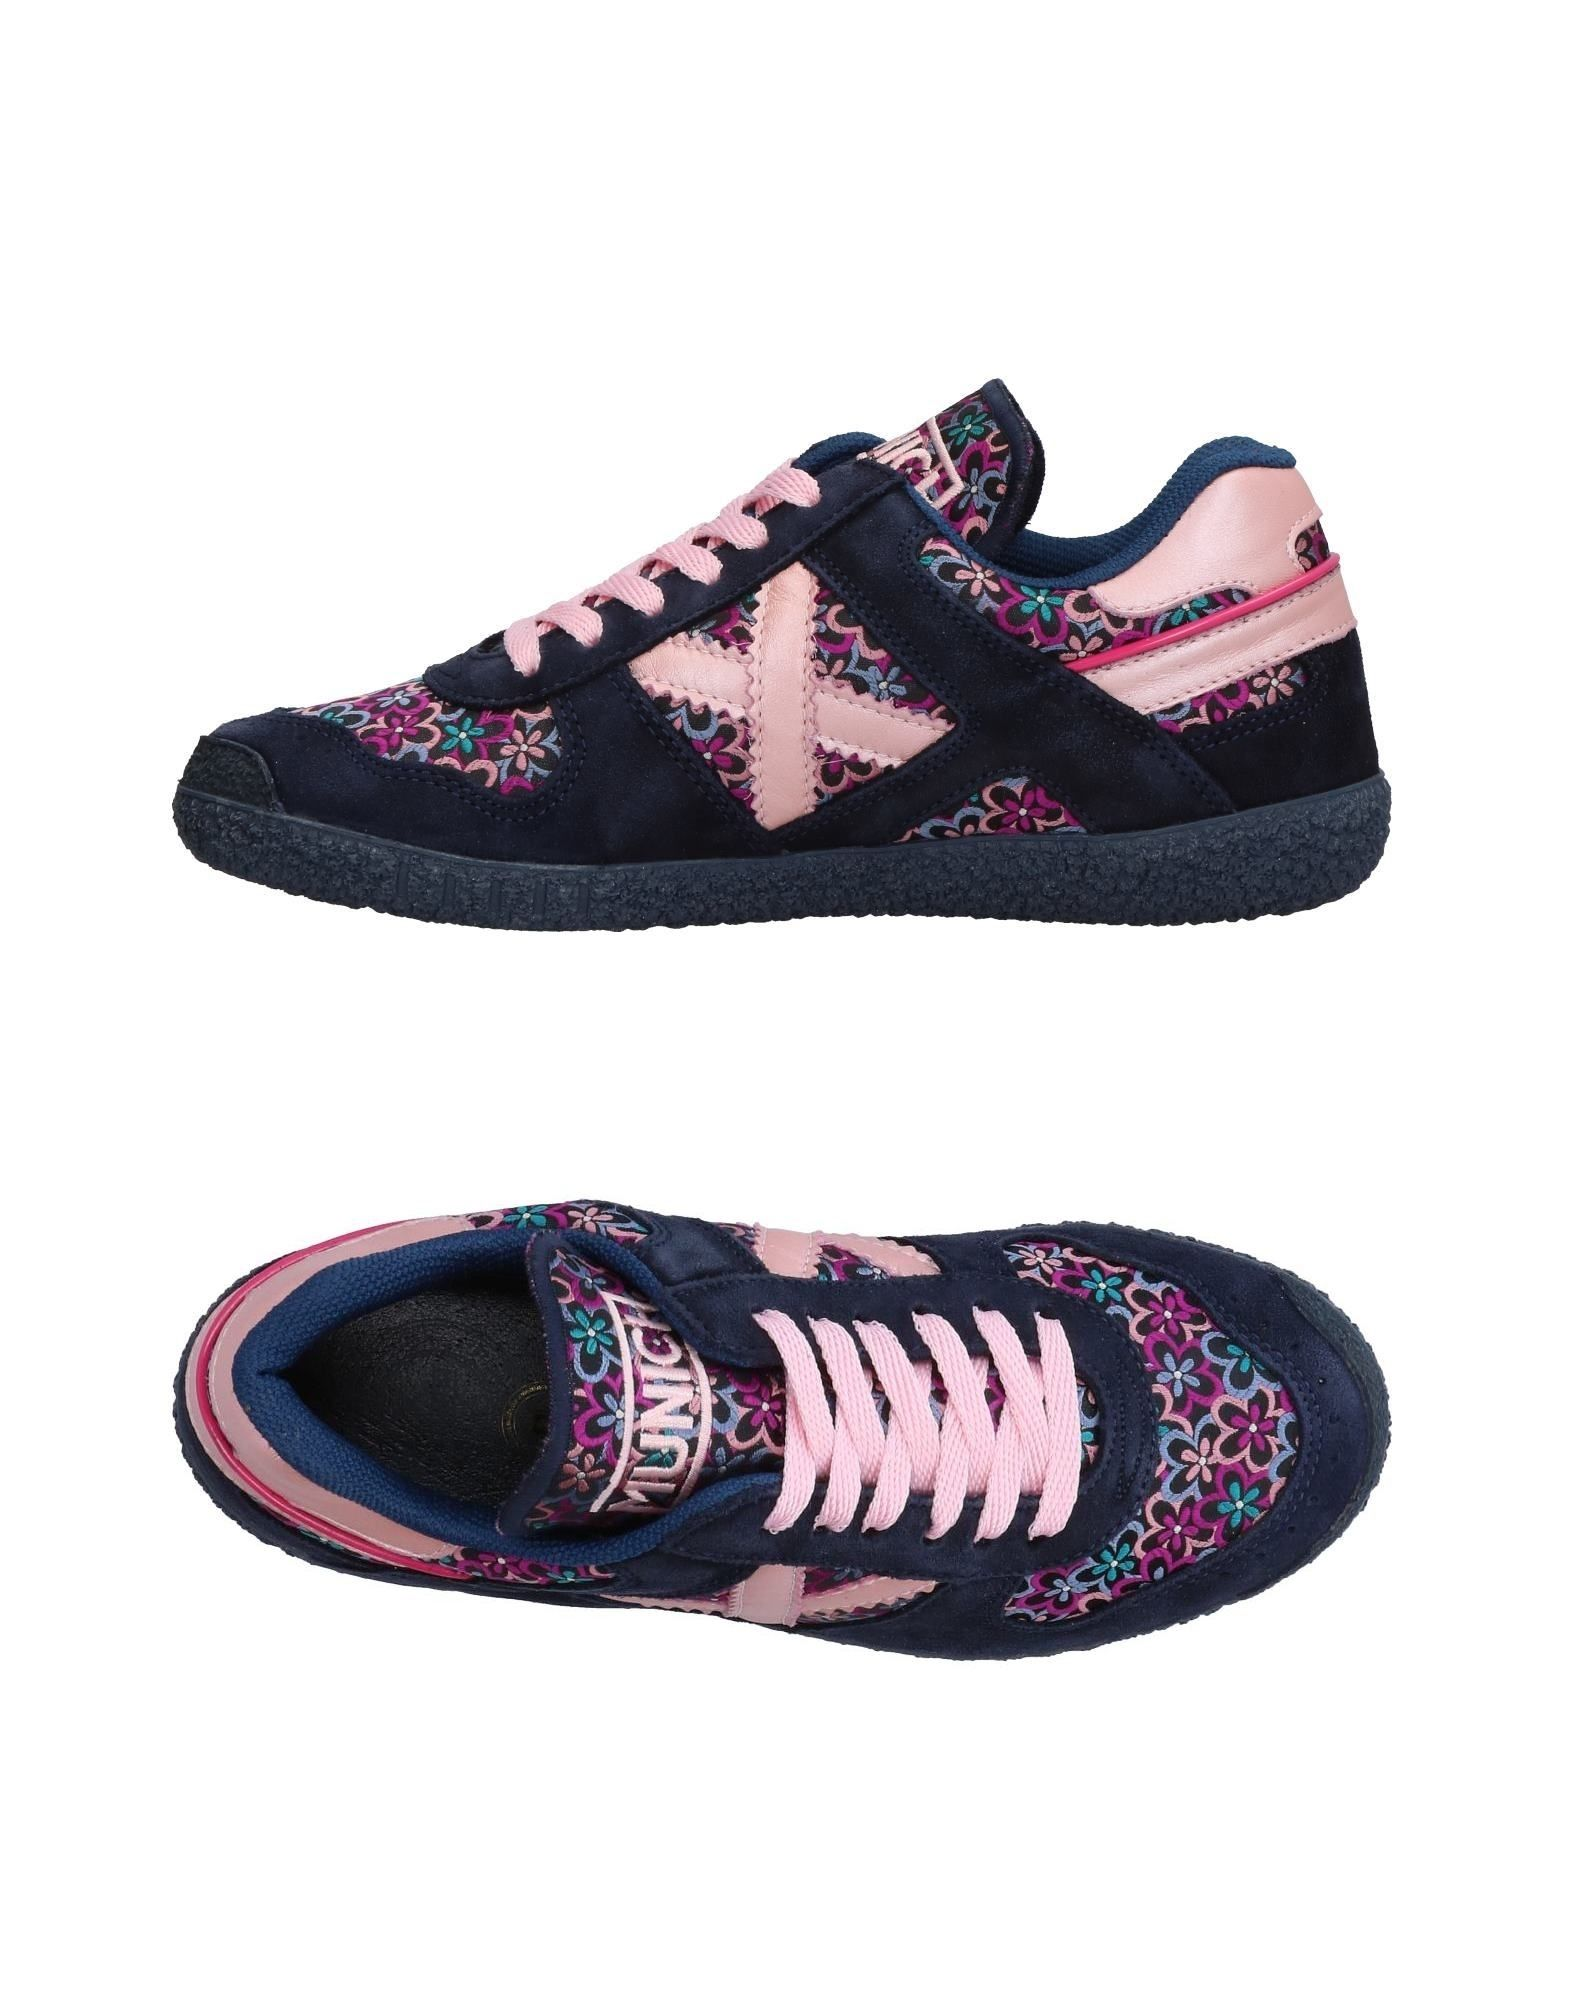 Sneakers Munich Donna - 11324637QU Scarpe comode e e comode distintive e50998